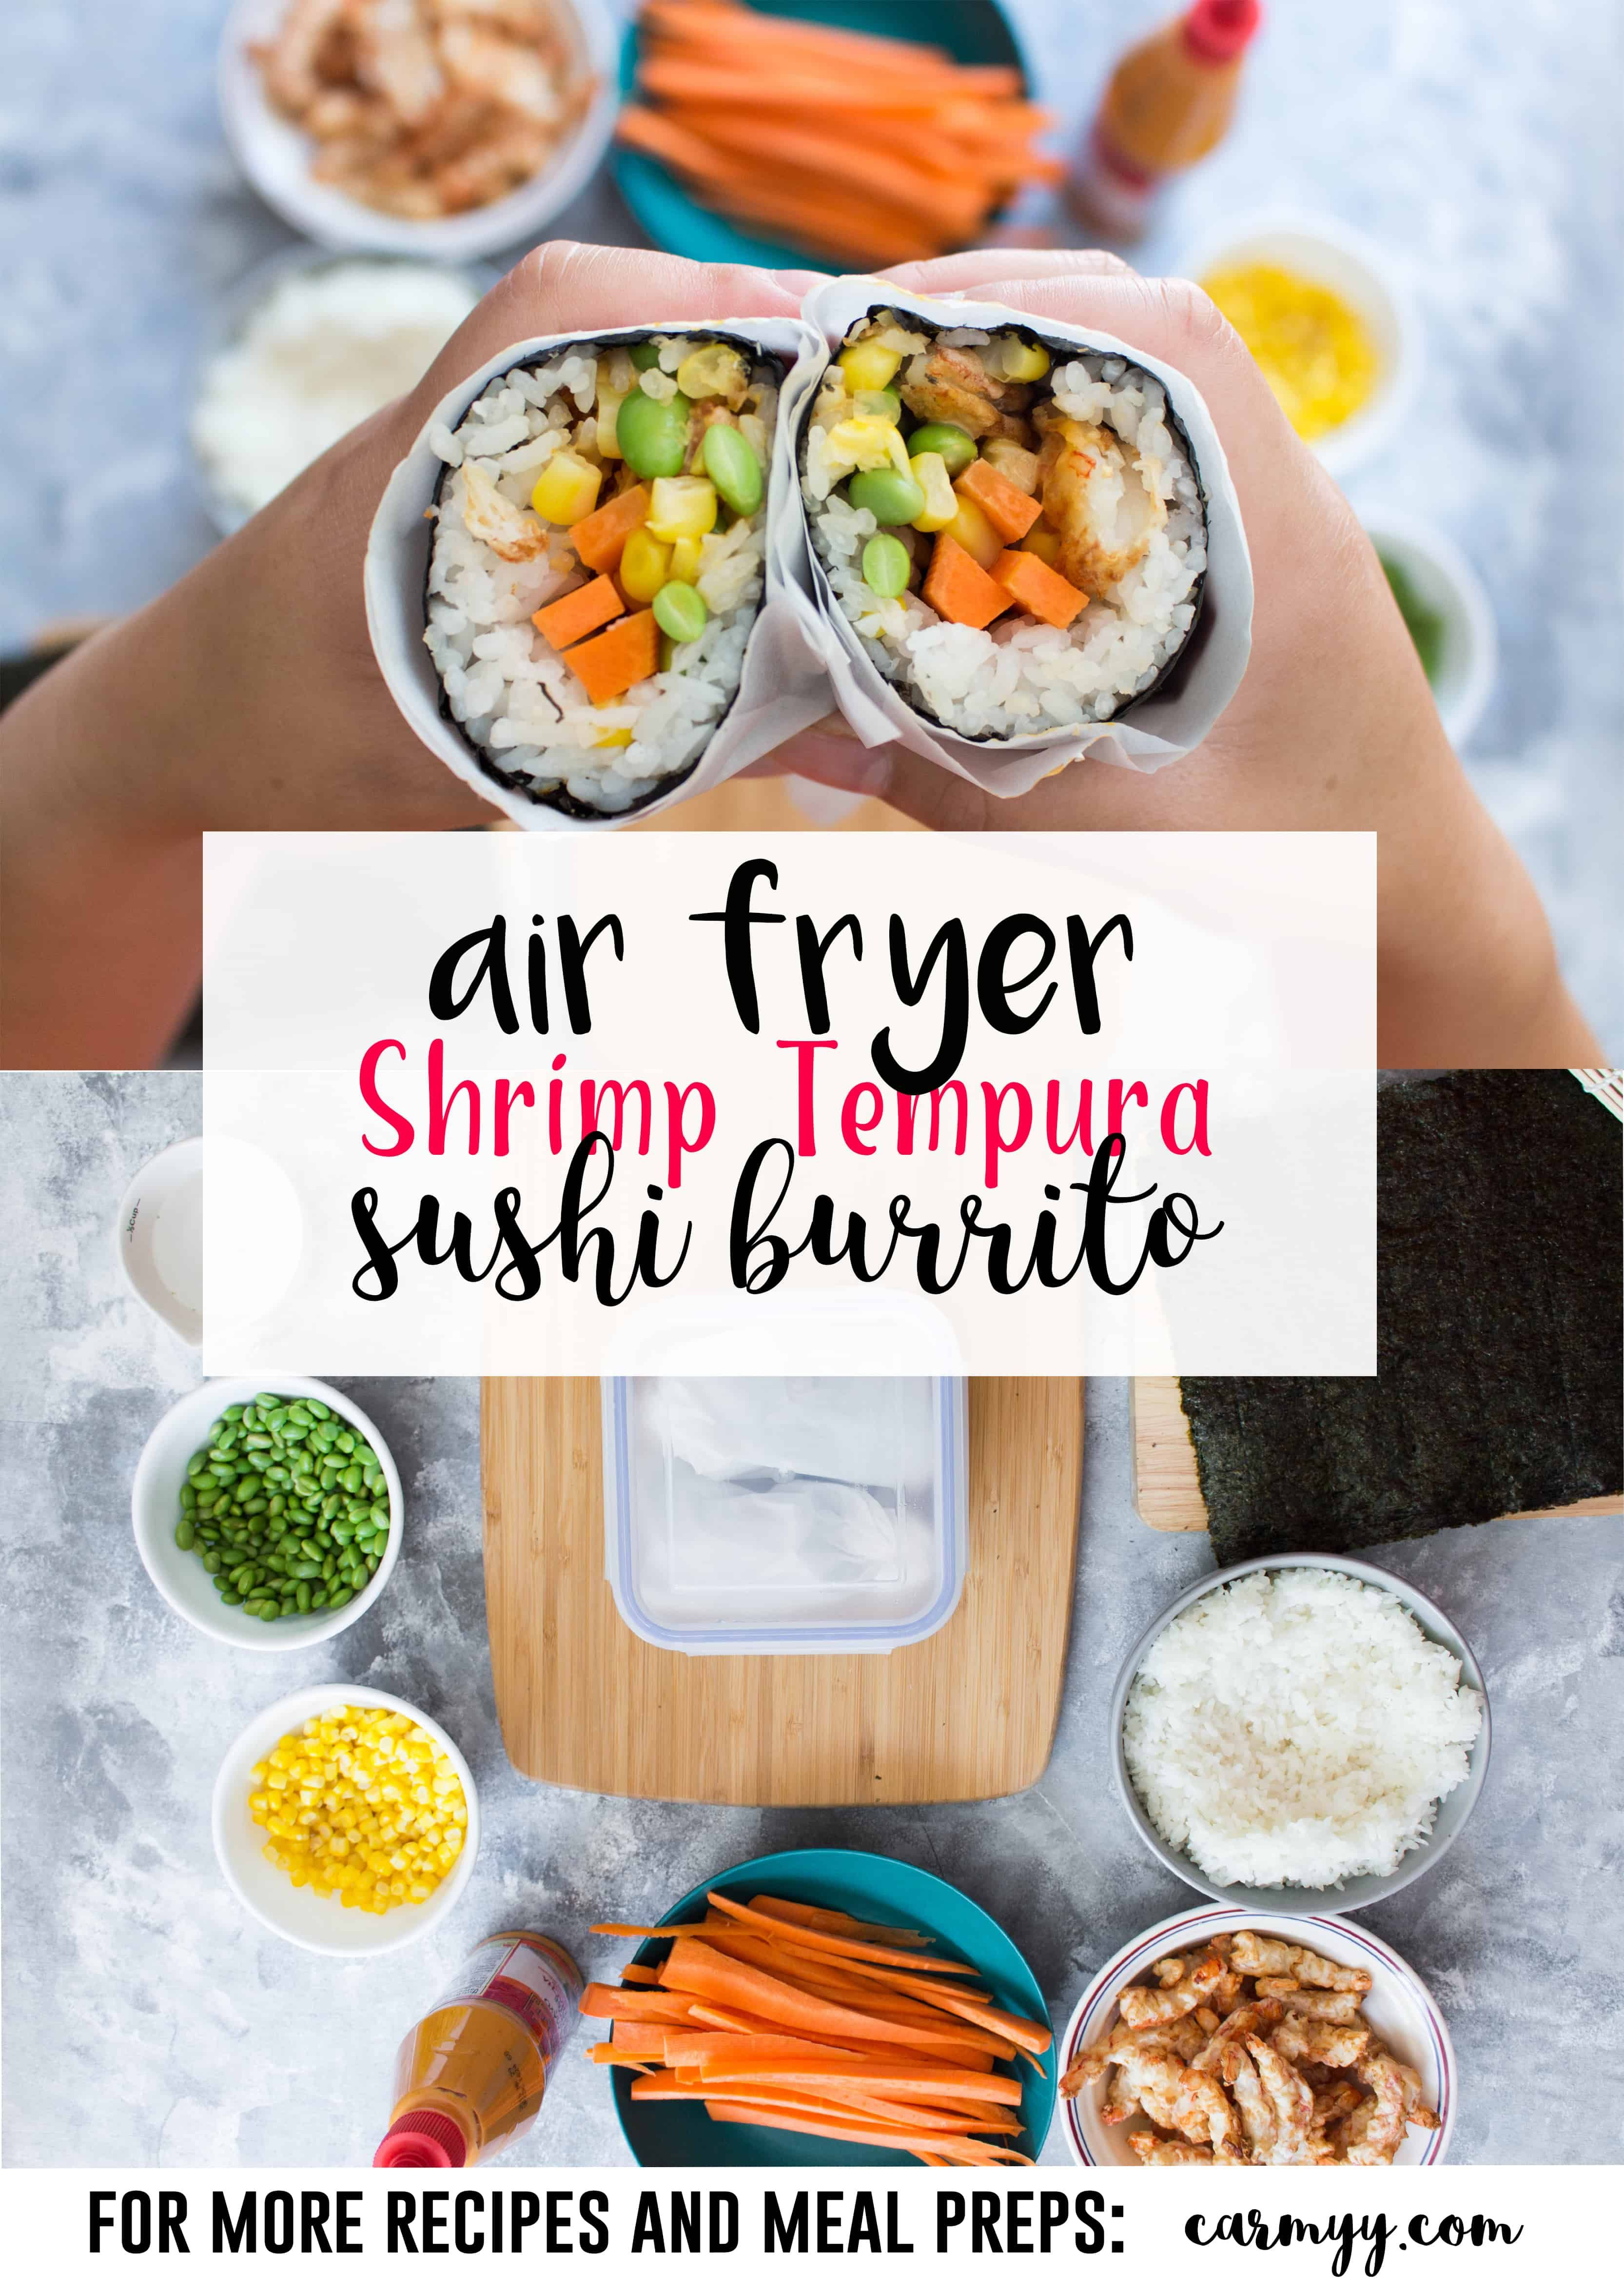 Airfryer Shrimp Tempura Sushi Burrito Recipe Dinner And Lunch